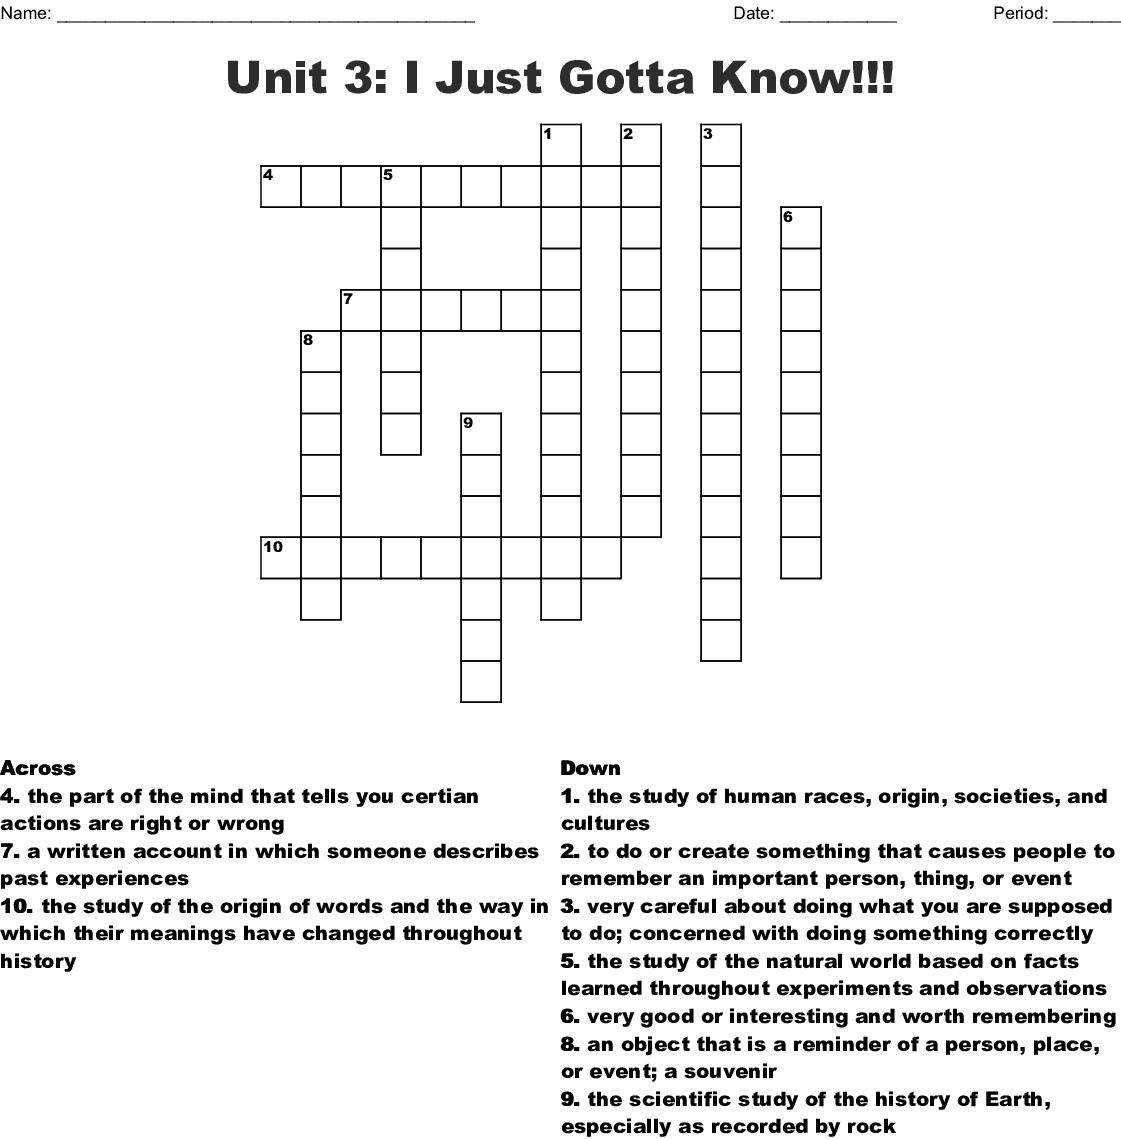 Unit 3 I Just Gotta Know Crossword